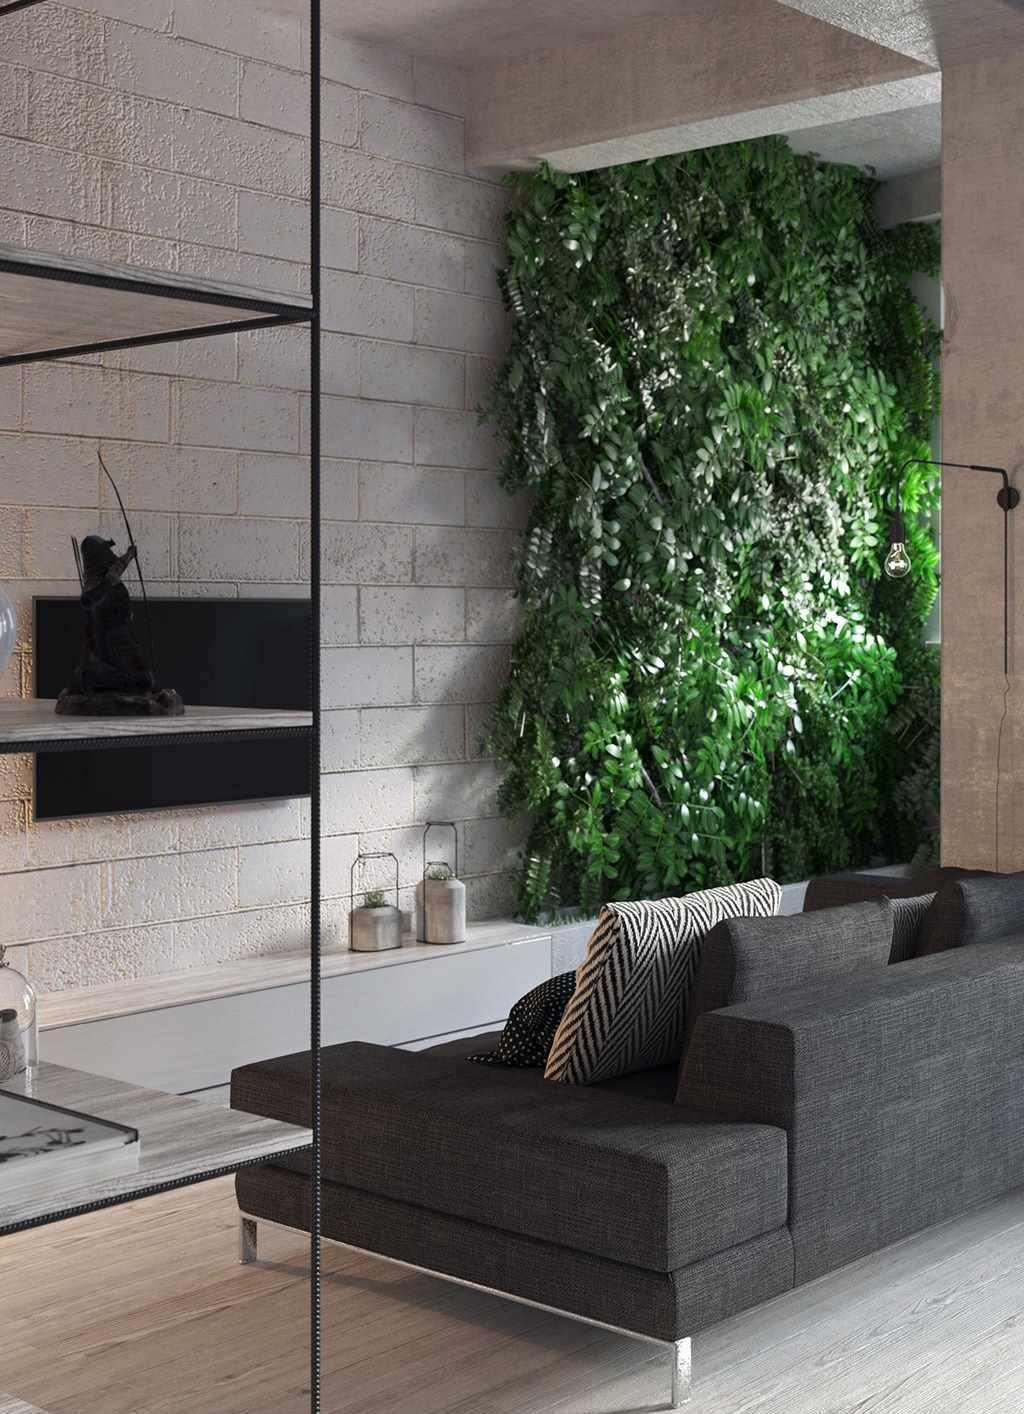 Parede de blocos de concreto com jardim vertical